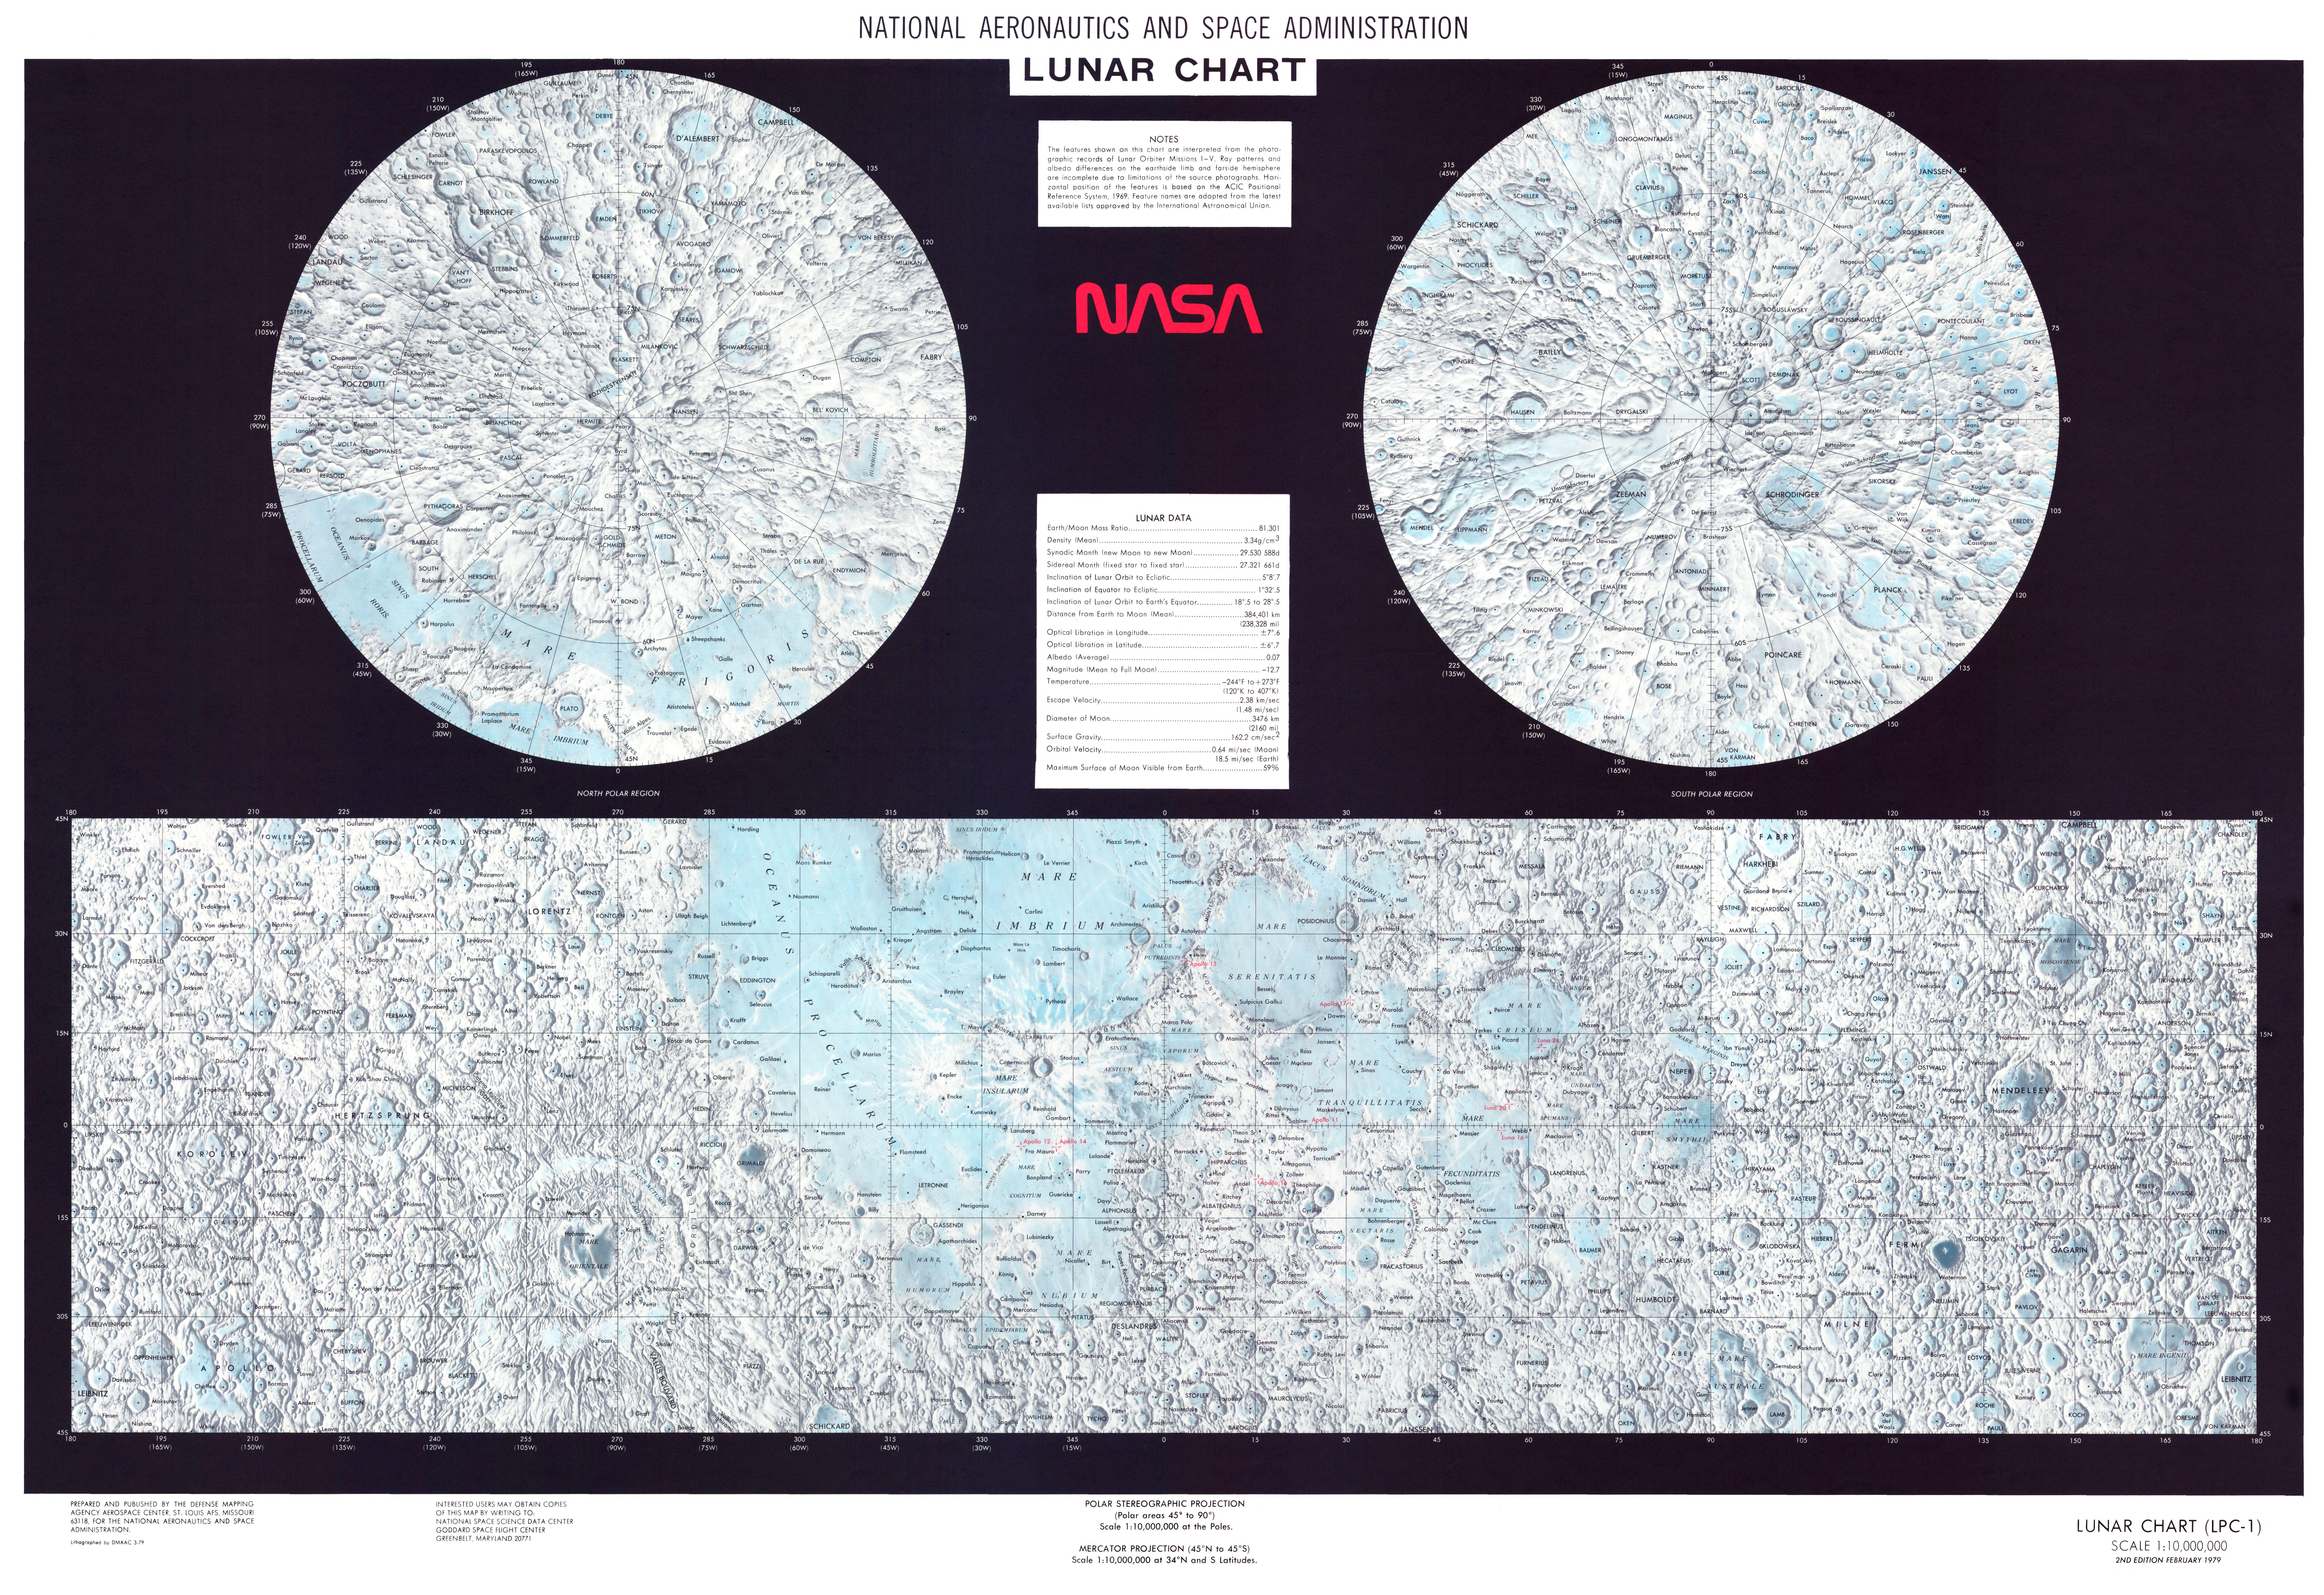 Moon Chart: Moon Map - LPC1 - NASA.jpg - Wikimedia Commons,Chart